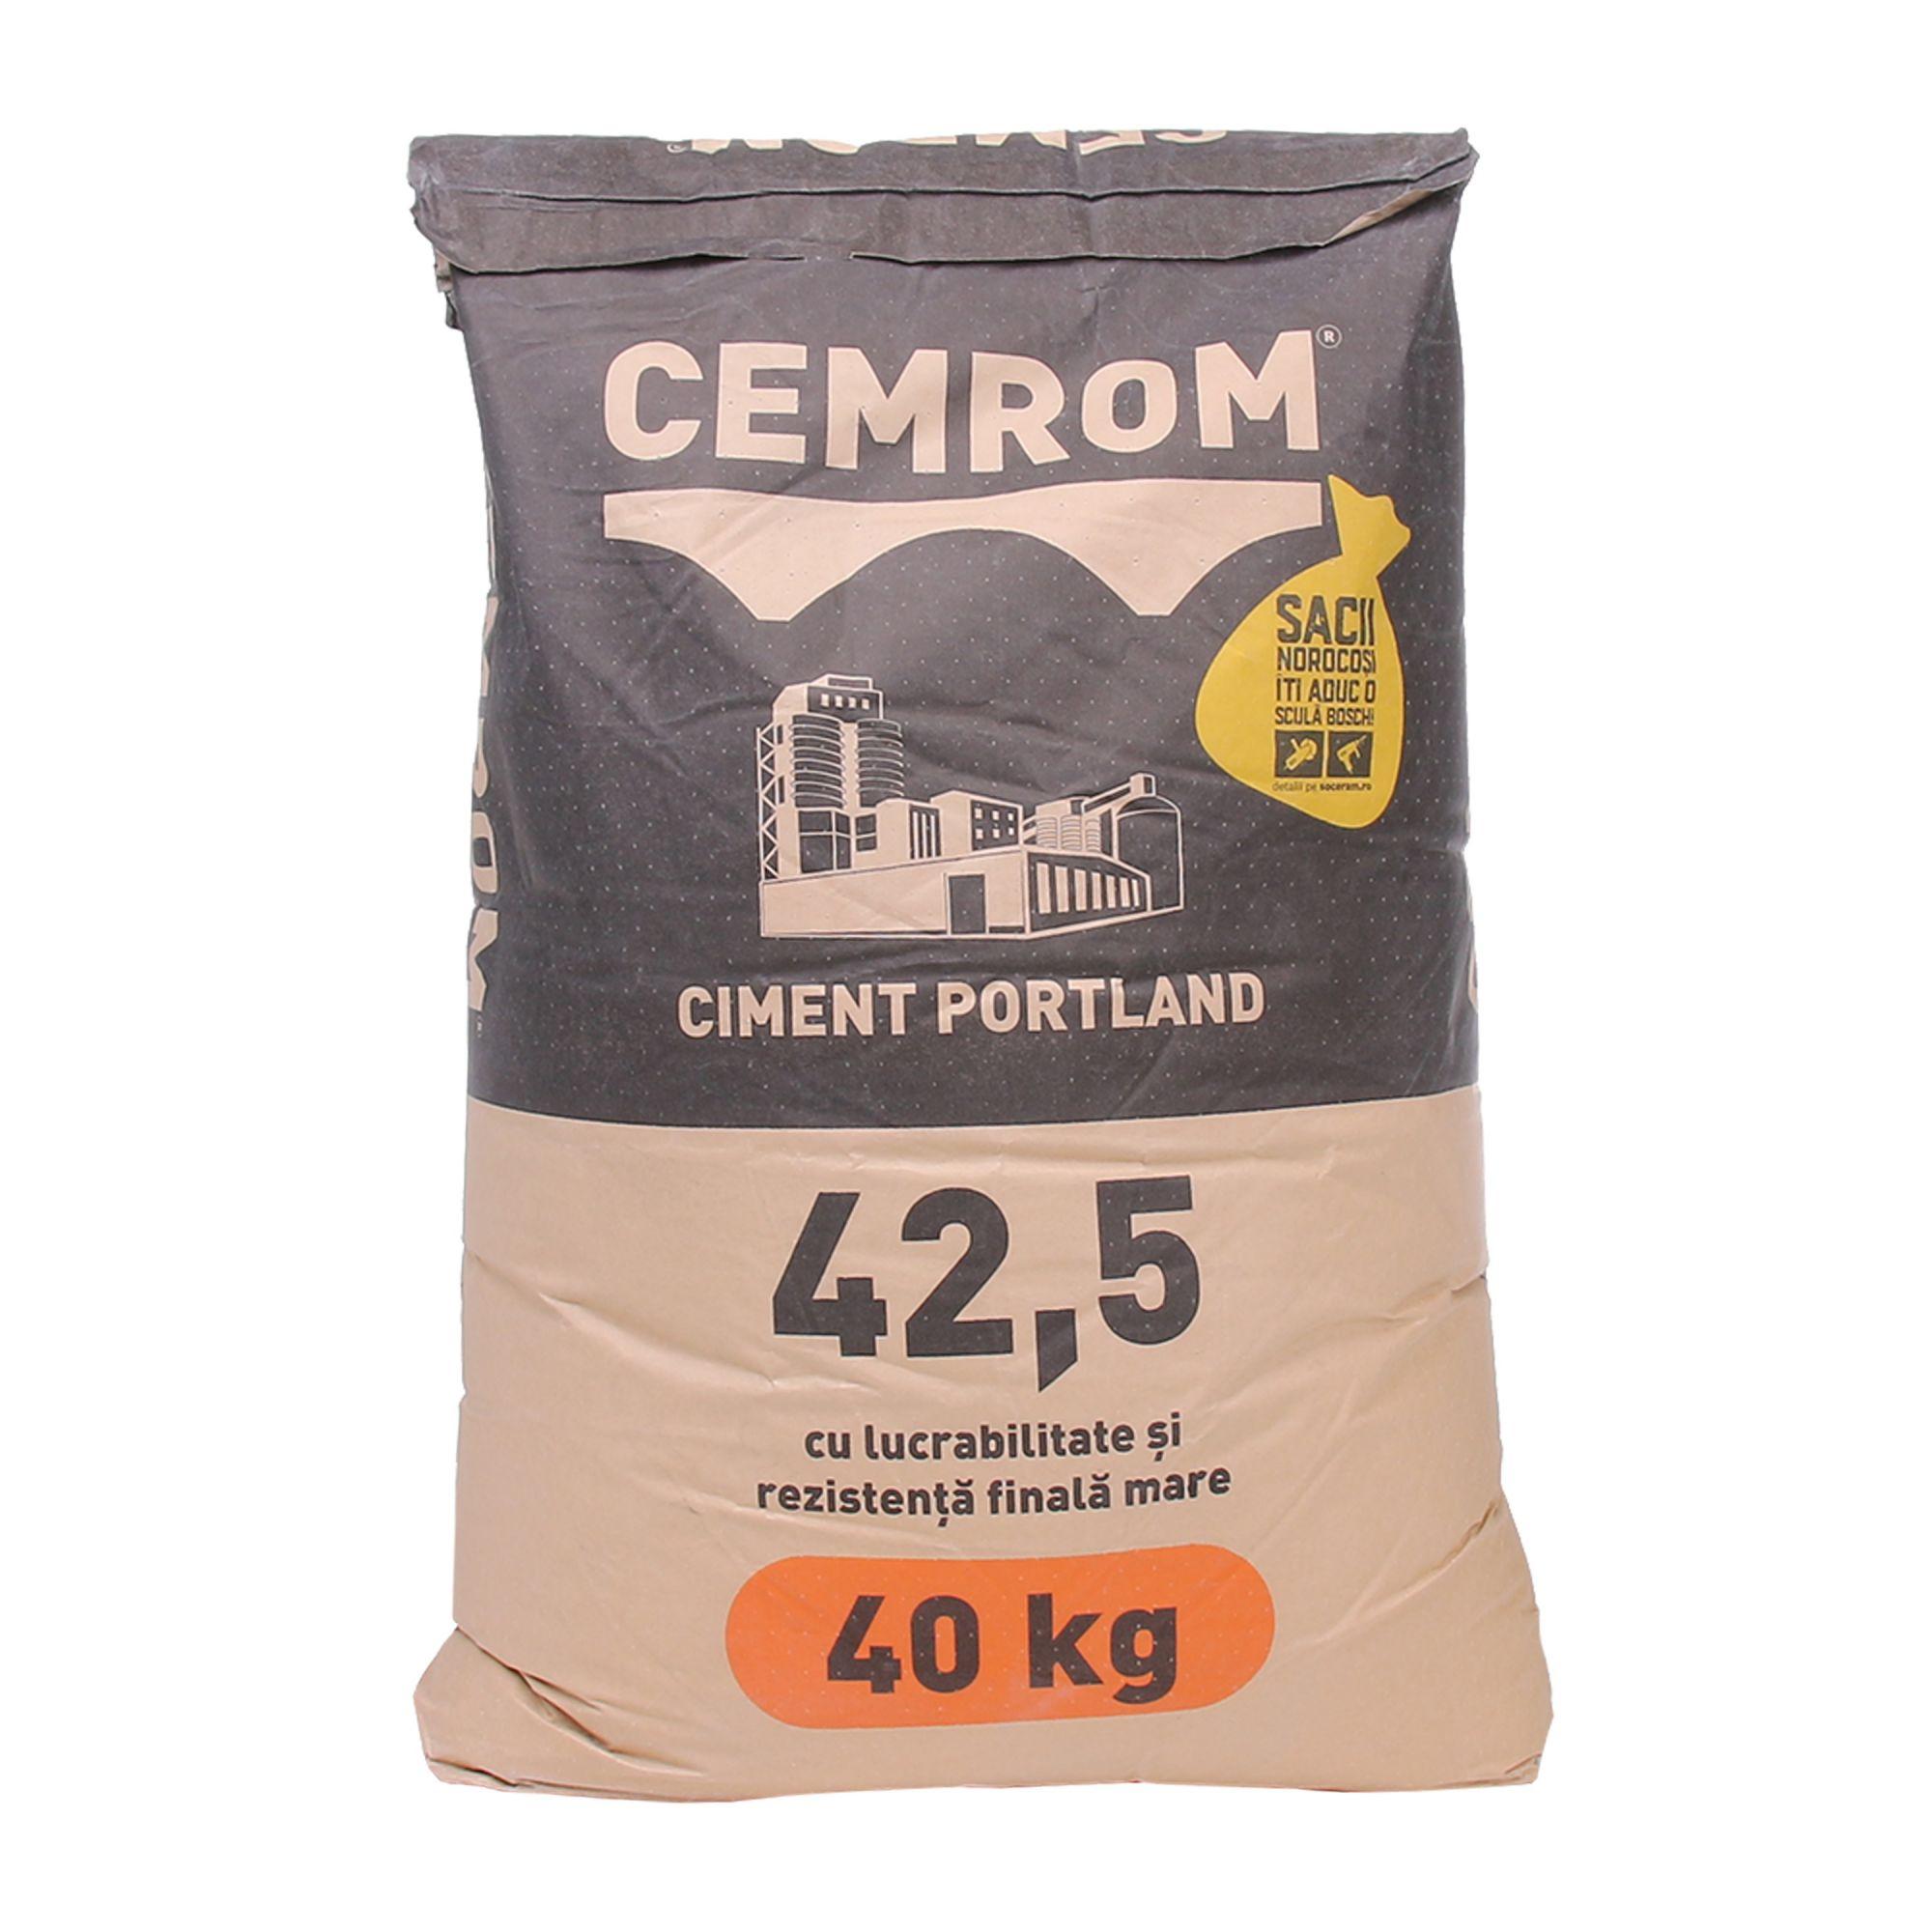 Cemrom Ciment Gri 42,5N 40 Kg pour Ciment Leroy Merlin